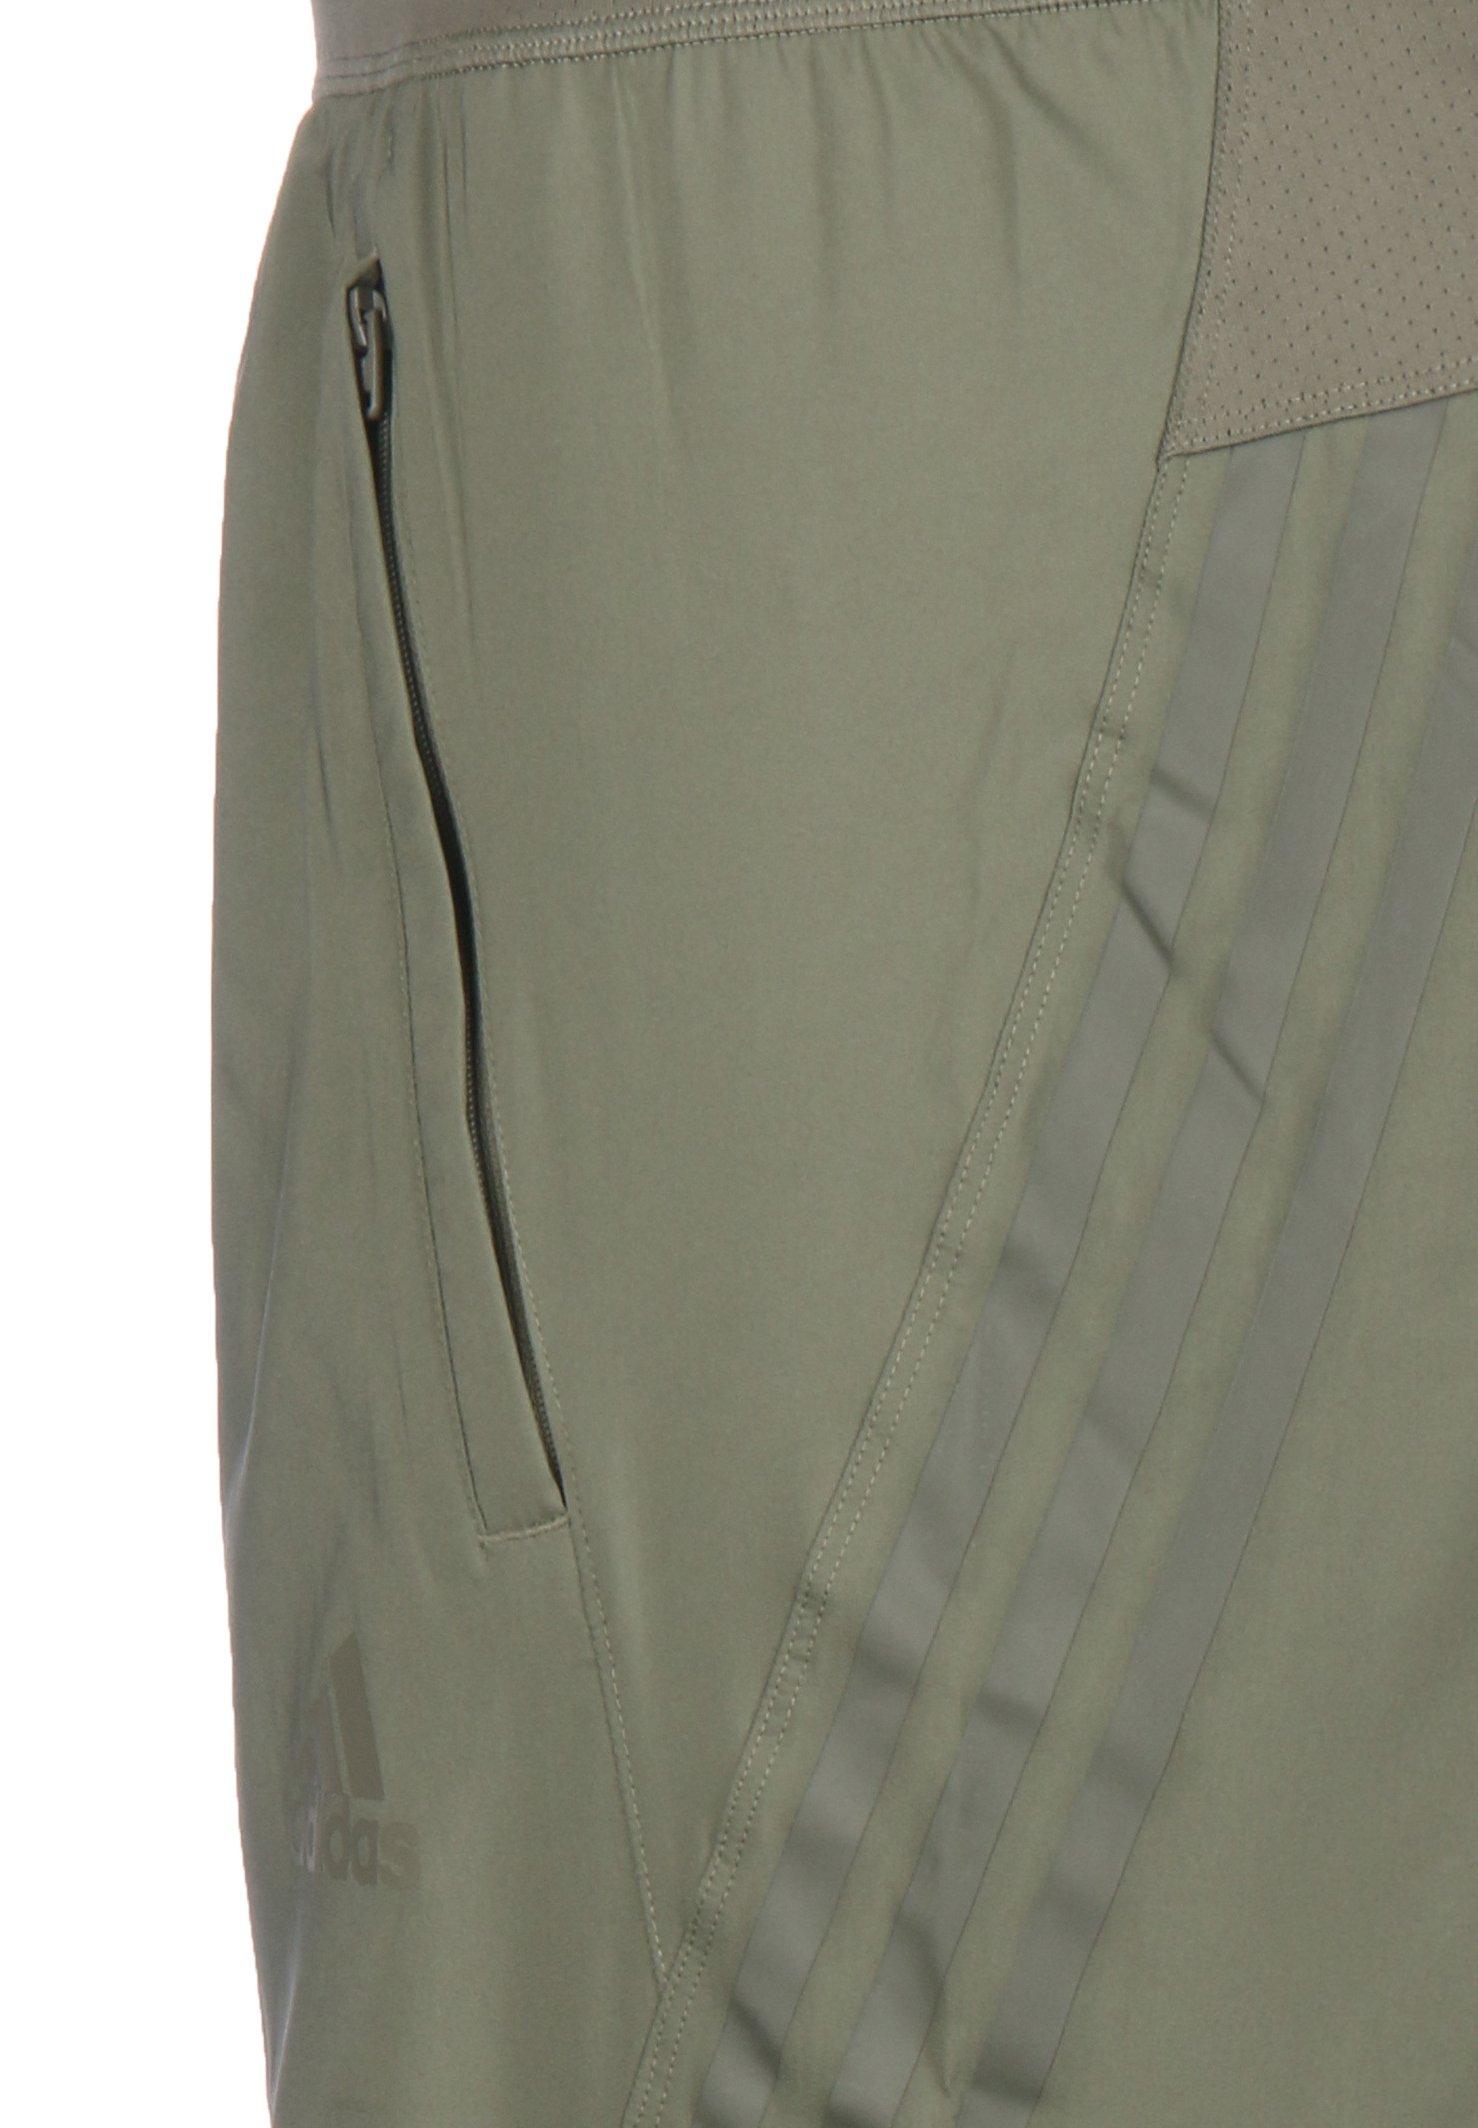 Adidas Performance Aeroready 3-stripes Trainingsshort Herren - Short De Sport Legacy Green ITaCE2C